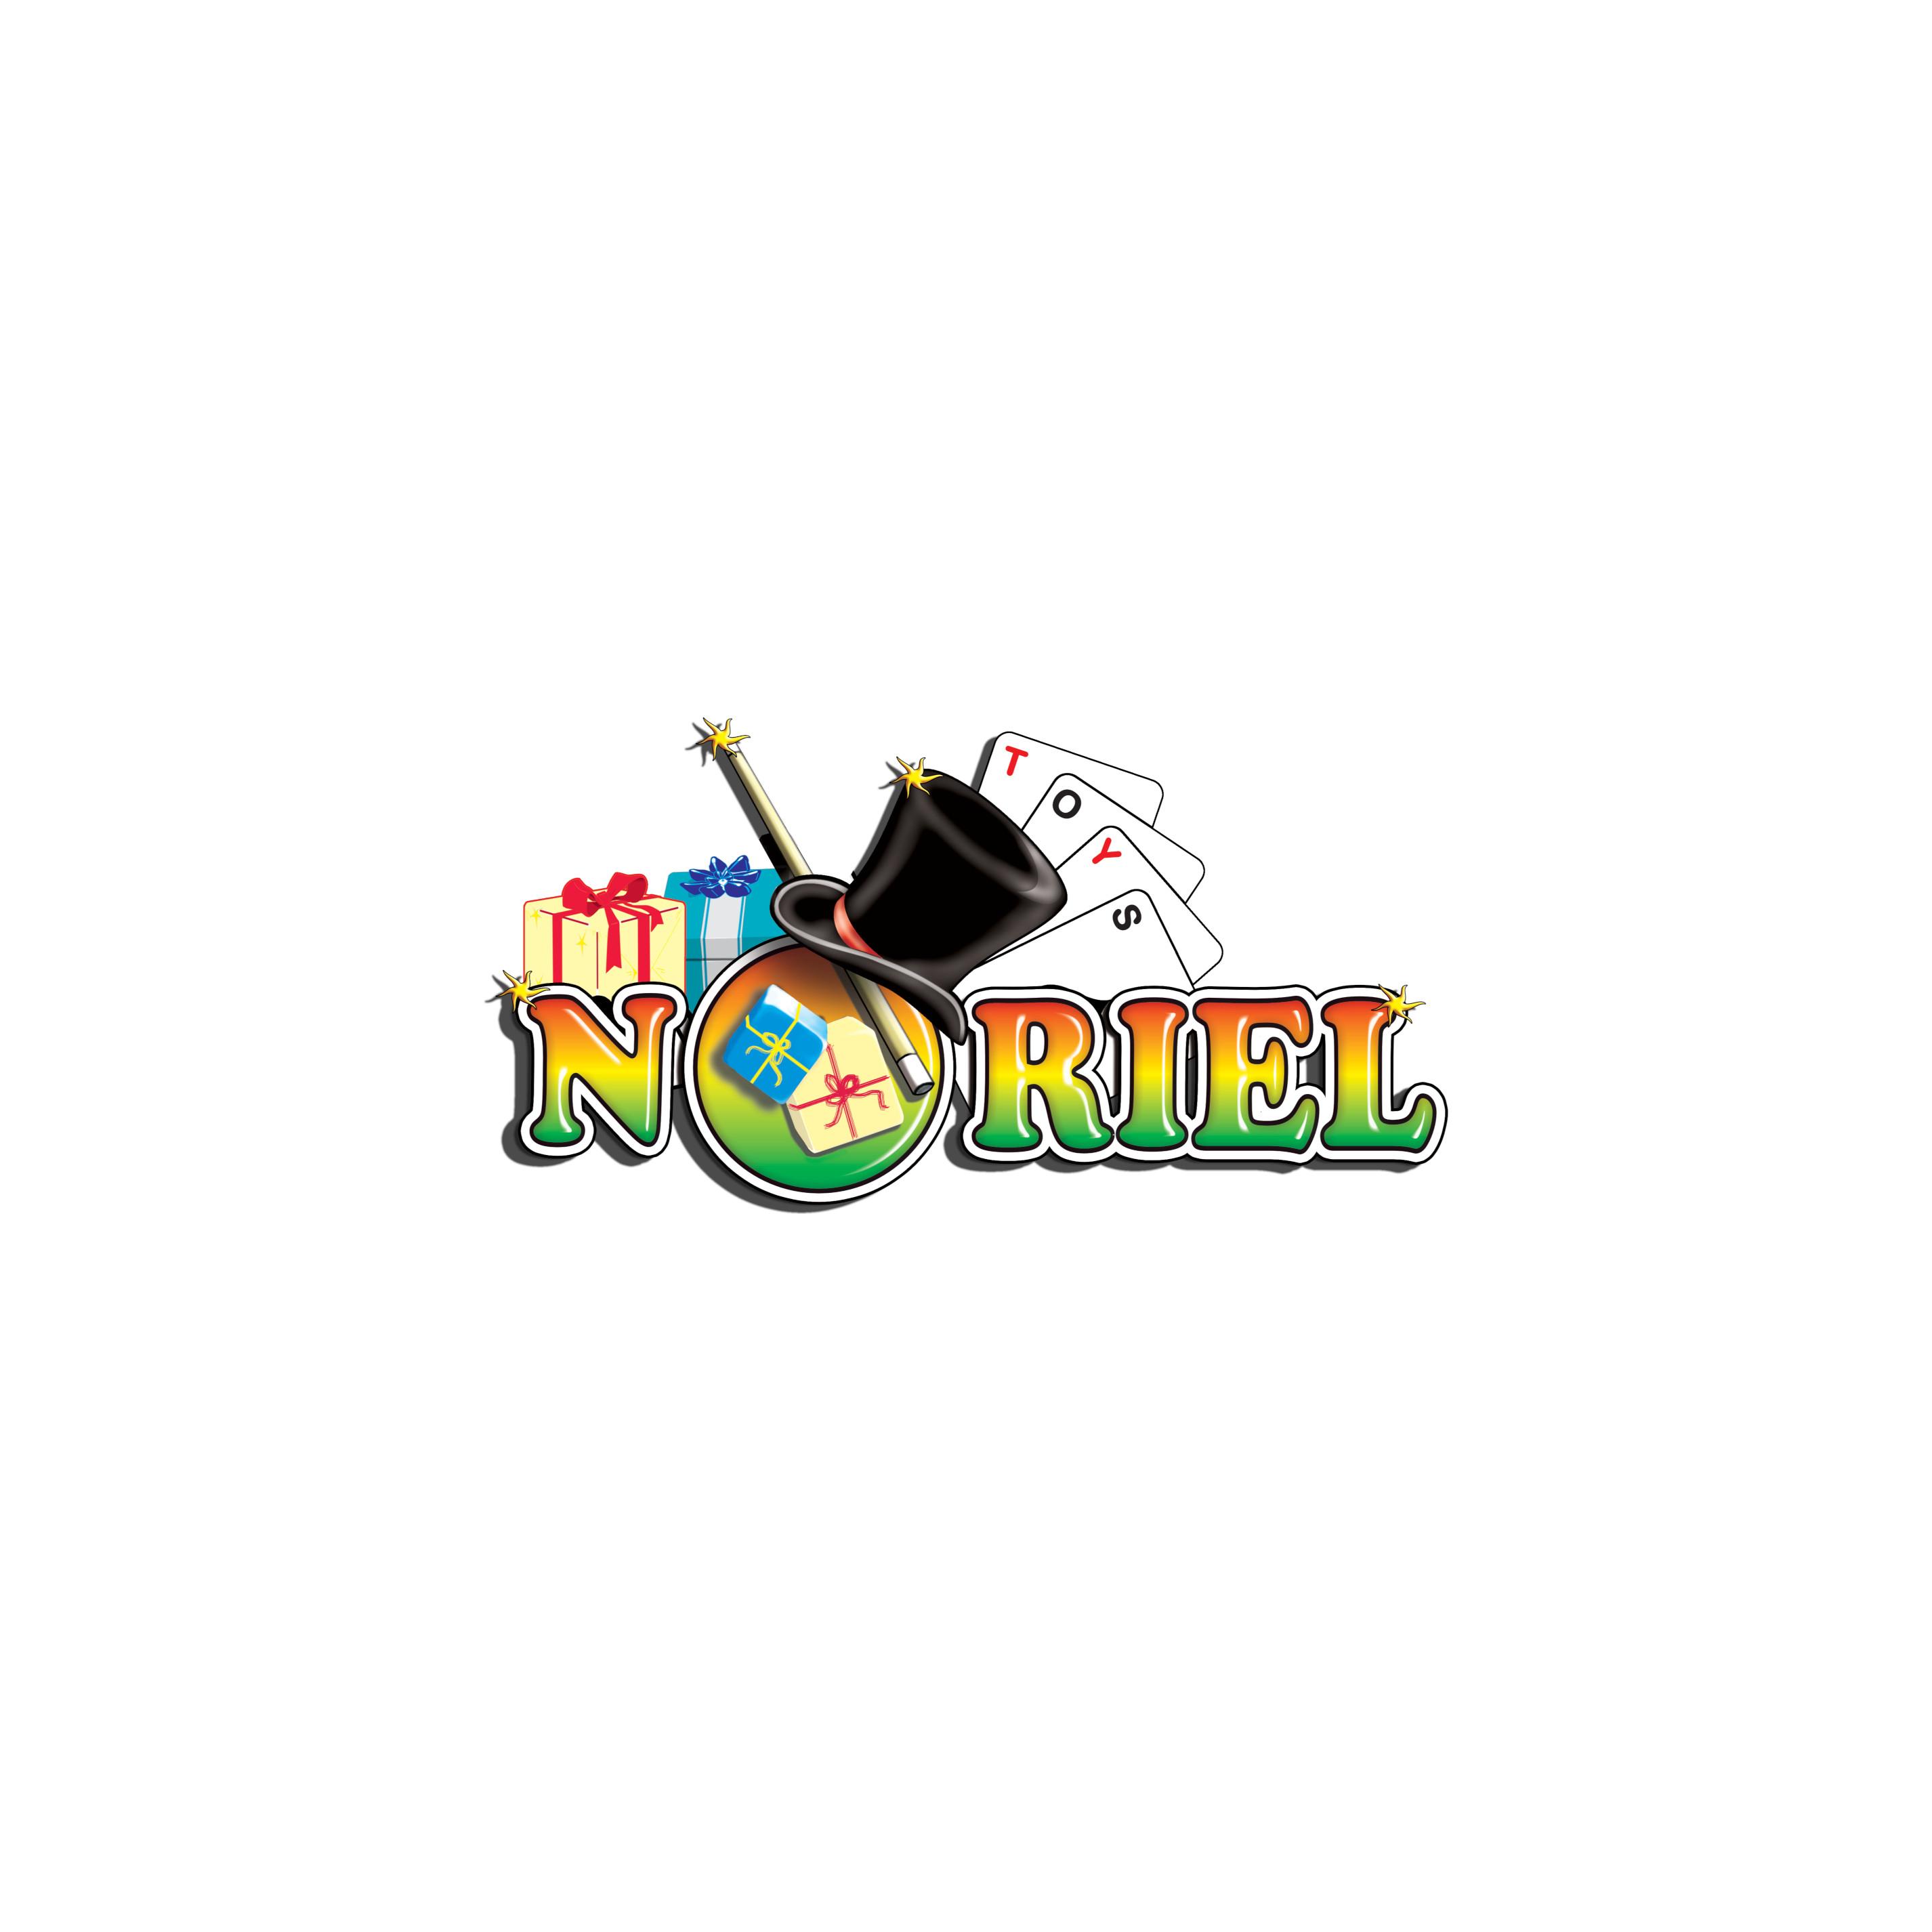 MP300TSZ_001w Primul meu Karaoke portabil cu 2 microfoane Toys Story 4